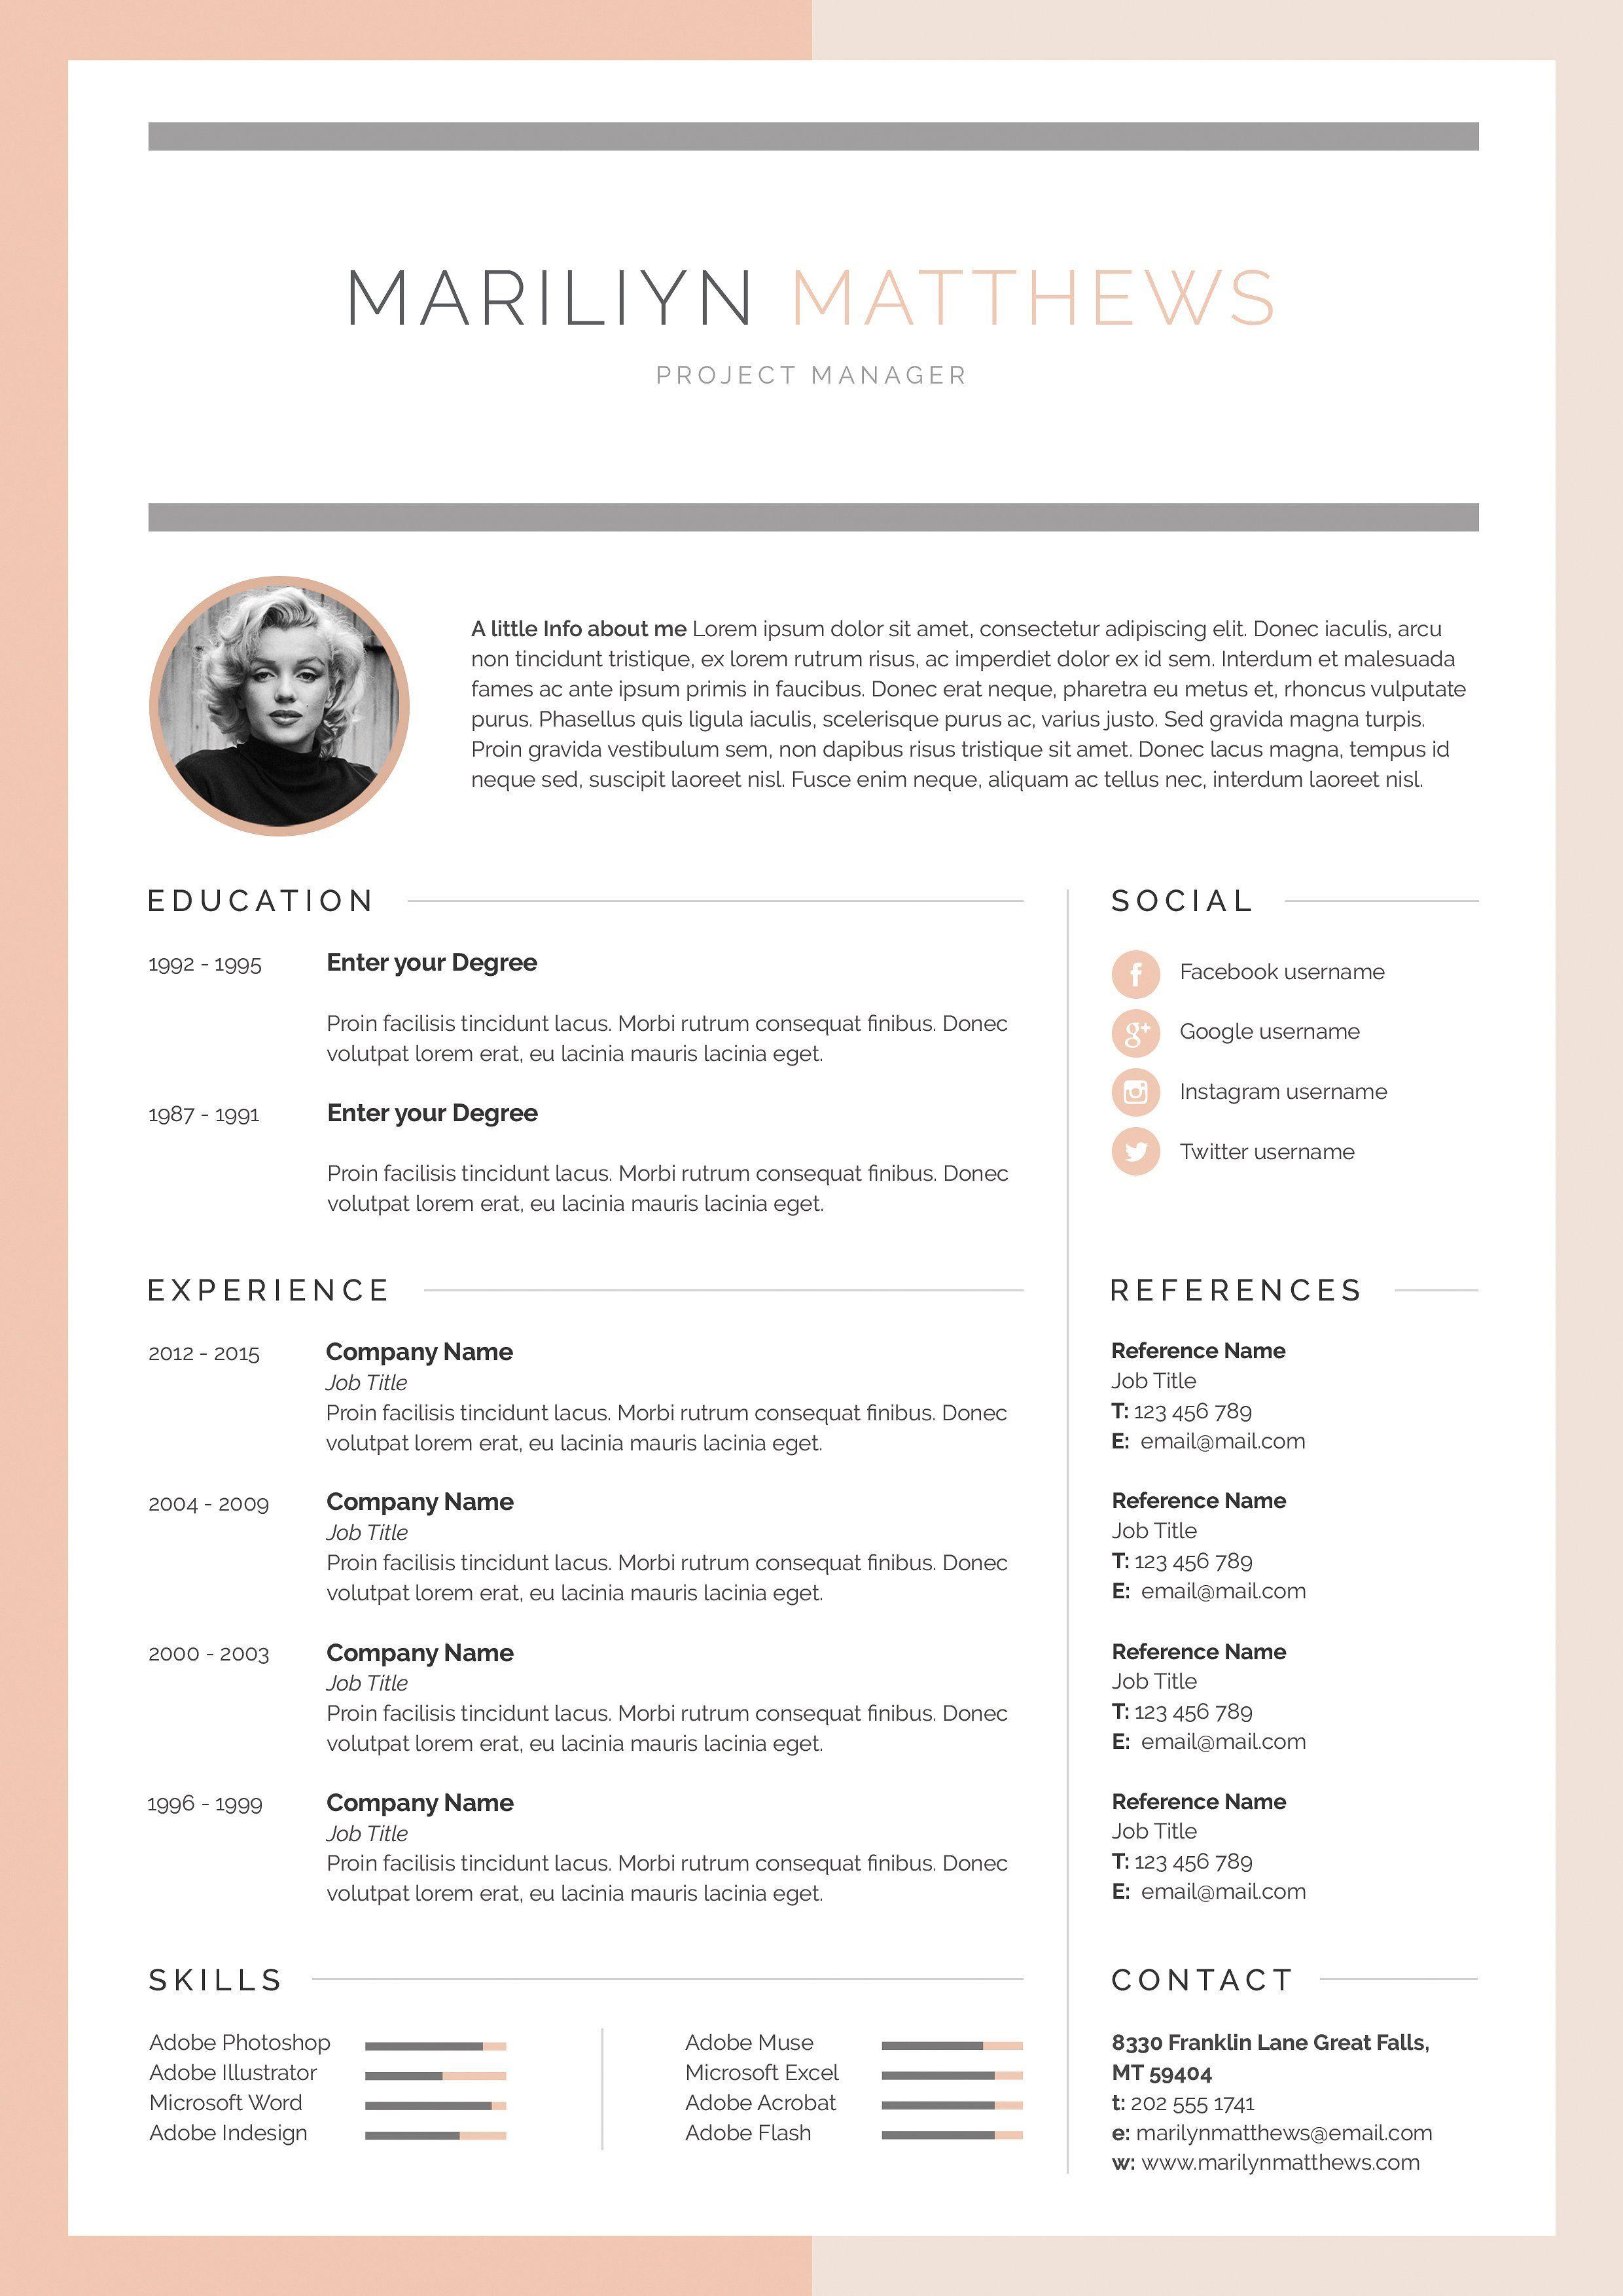 Word Resume & Cover Letter Template Resume cover letter